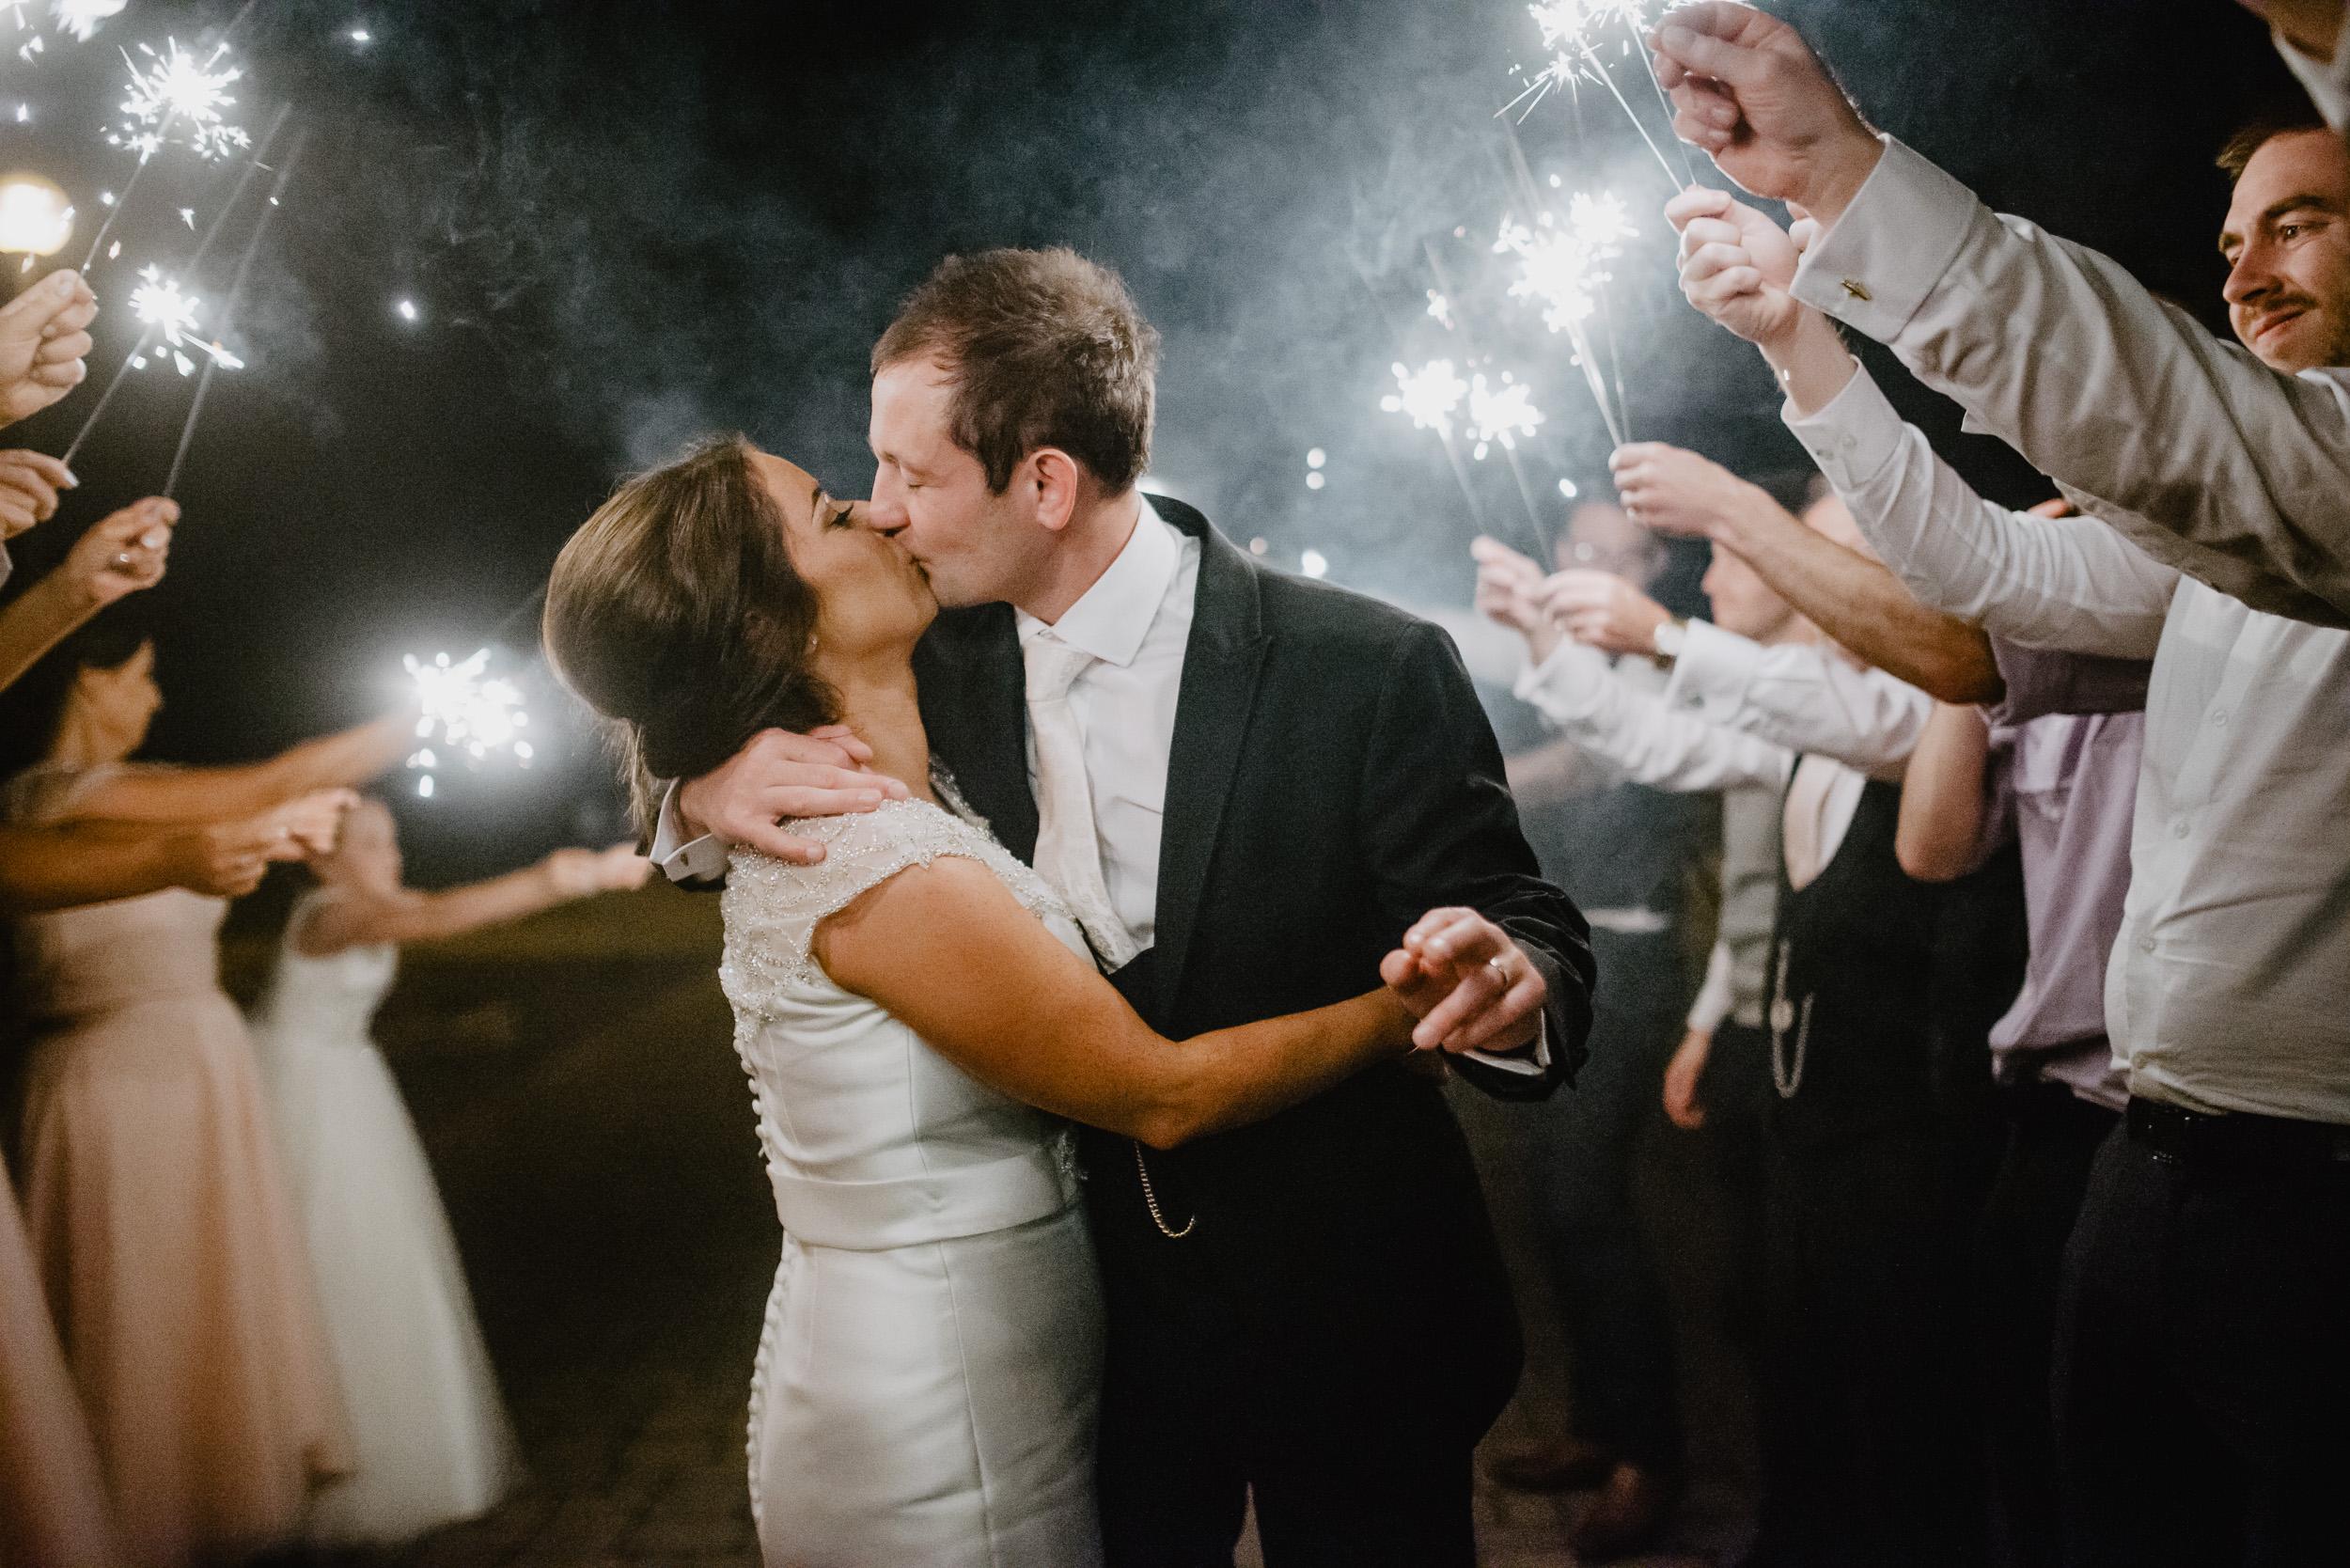 wedding photogaphy peter mackey 2018 claire-7.jpg